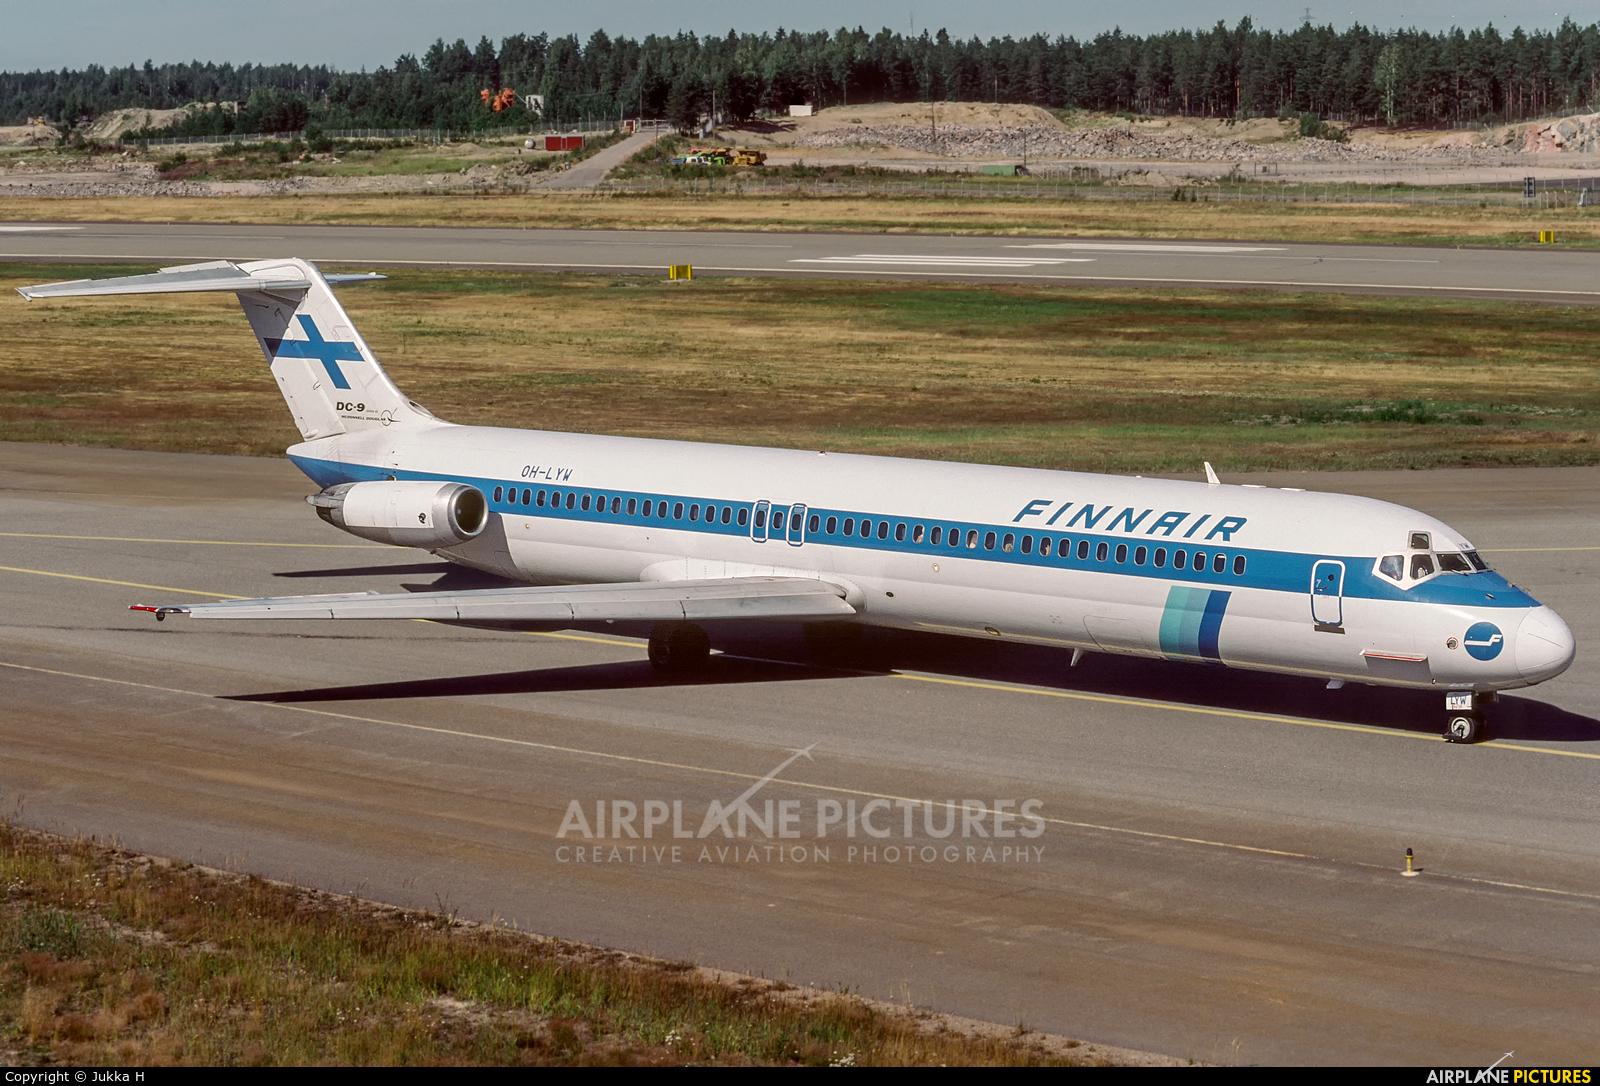 Finnair OH-LYW aircraft at Helsinki - Vantaa